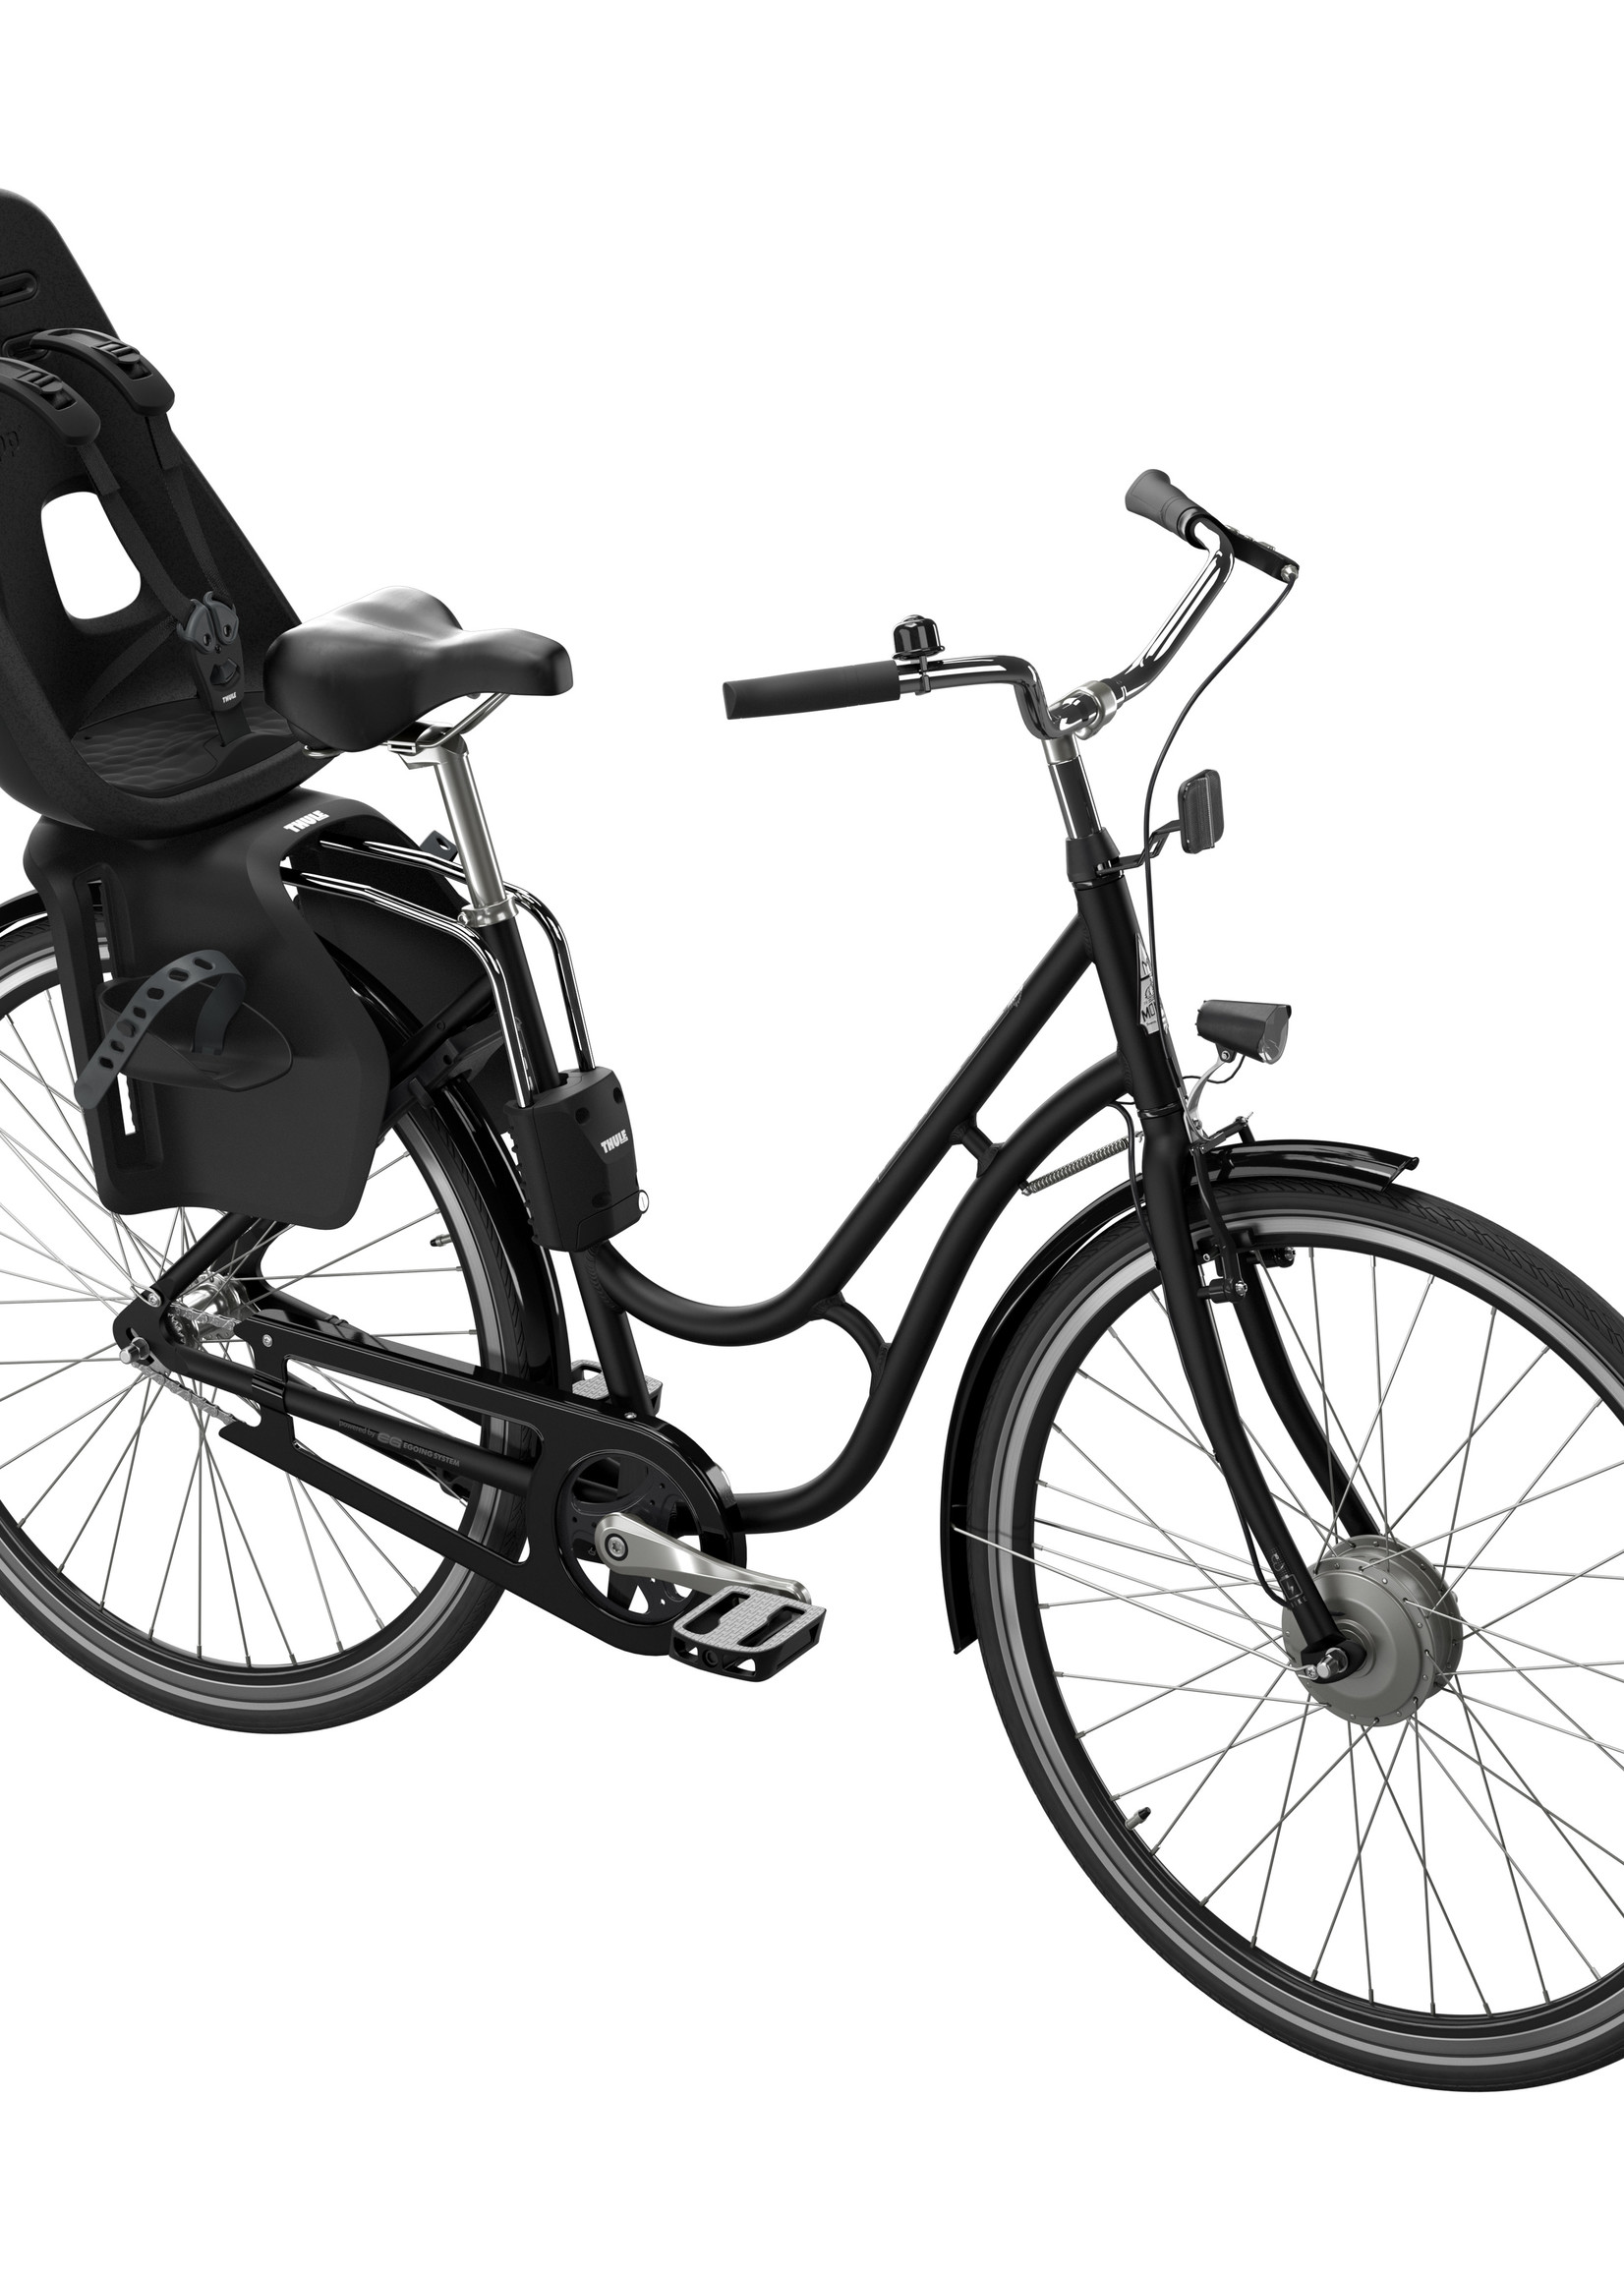 Thule Yepp Nexxt Maxi - Frame Mounted